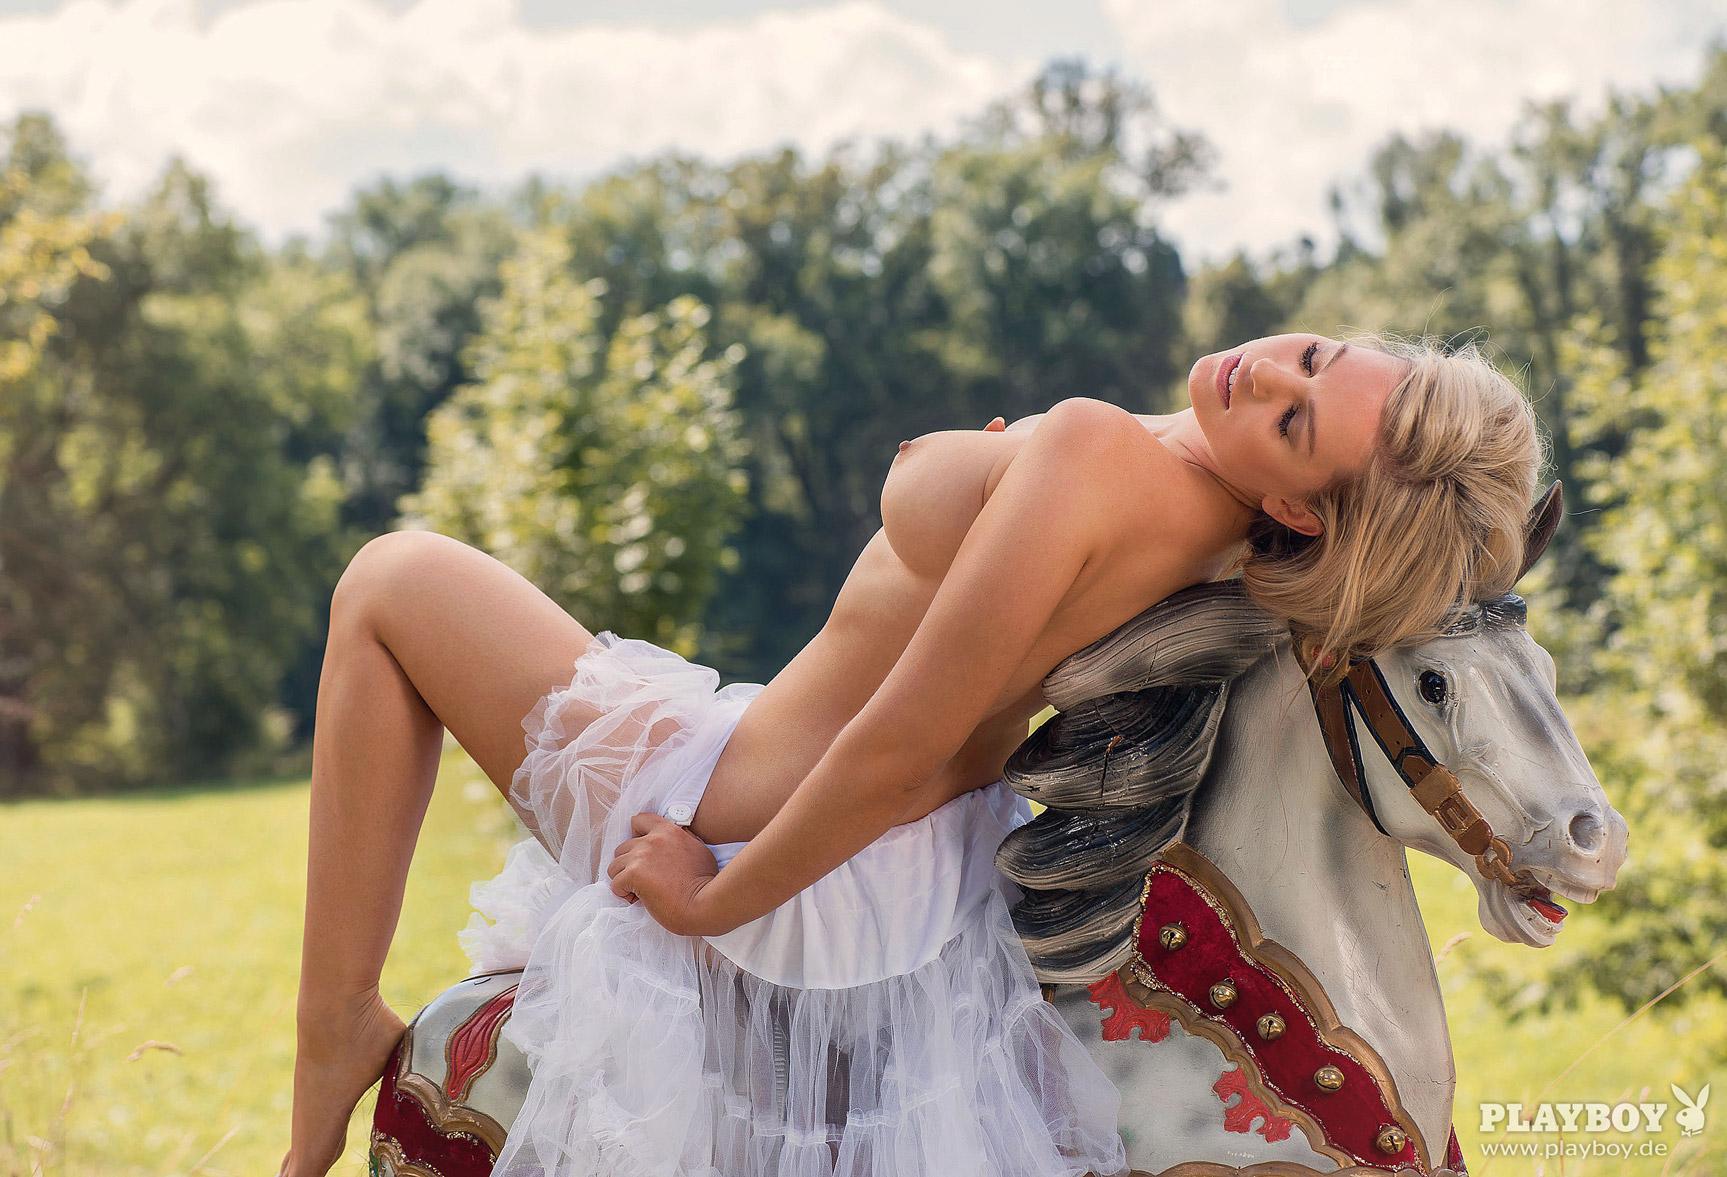 Девушка месяца Кати Керн / Kathie Kern - Playboy Germany october 2016 playmate / outtake